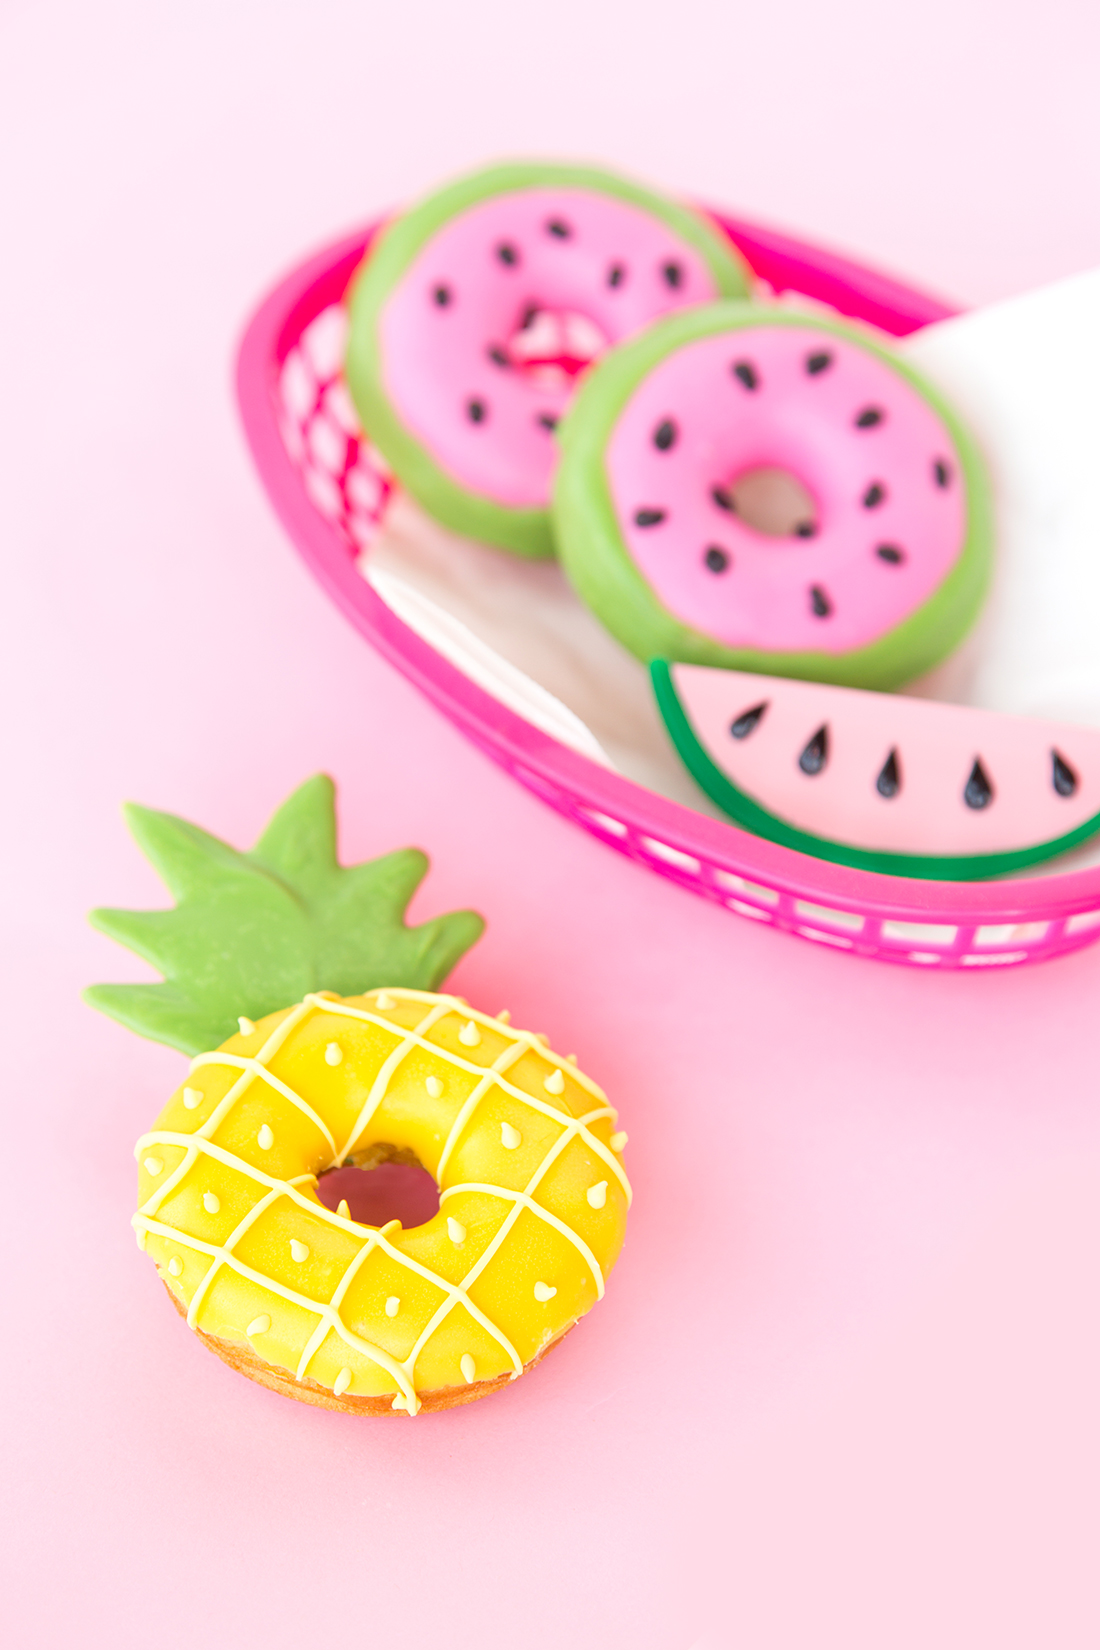 Watermelon Wallpaper Cute One 187 Summer Fruit Slice Donuts